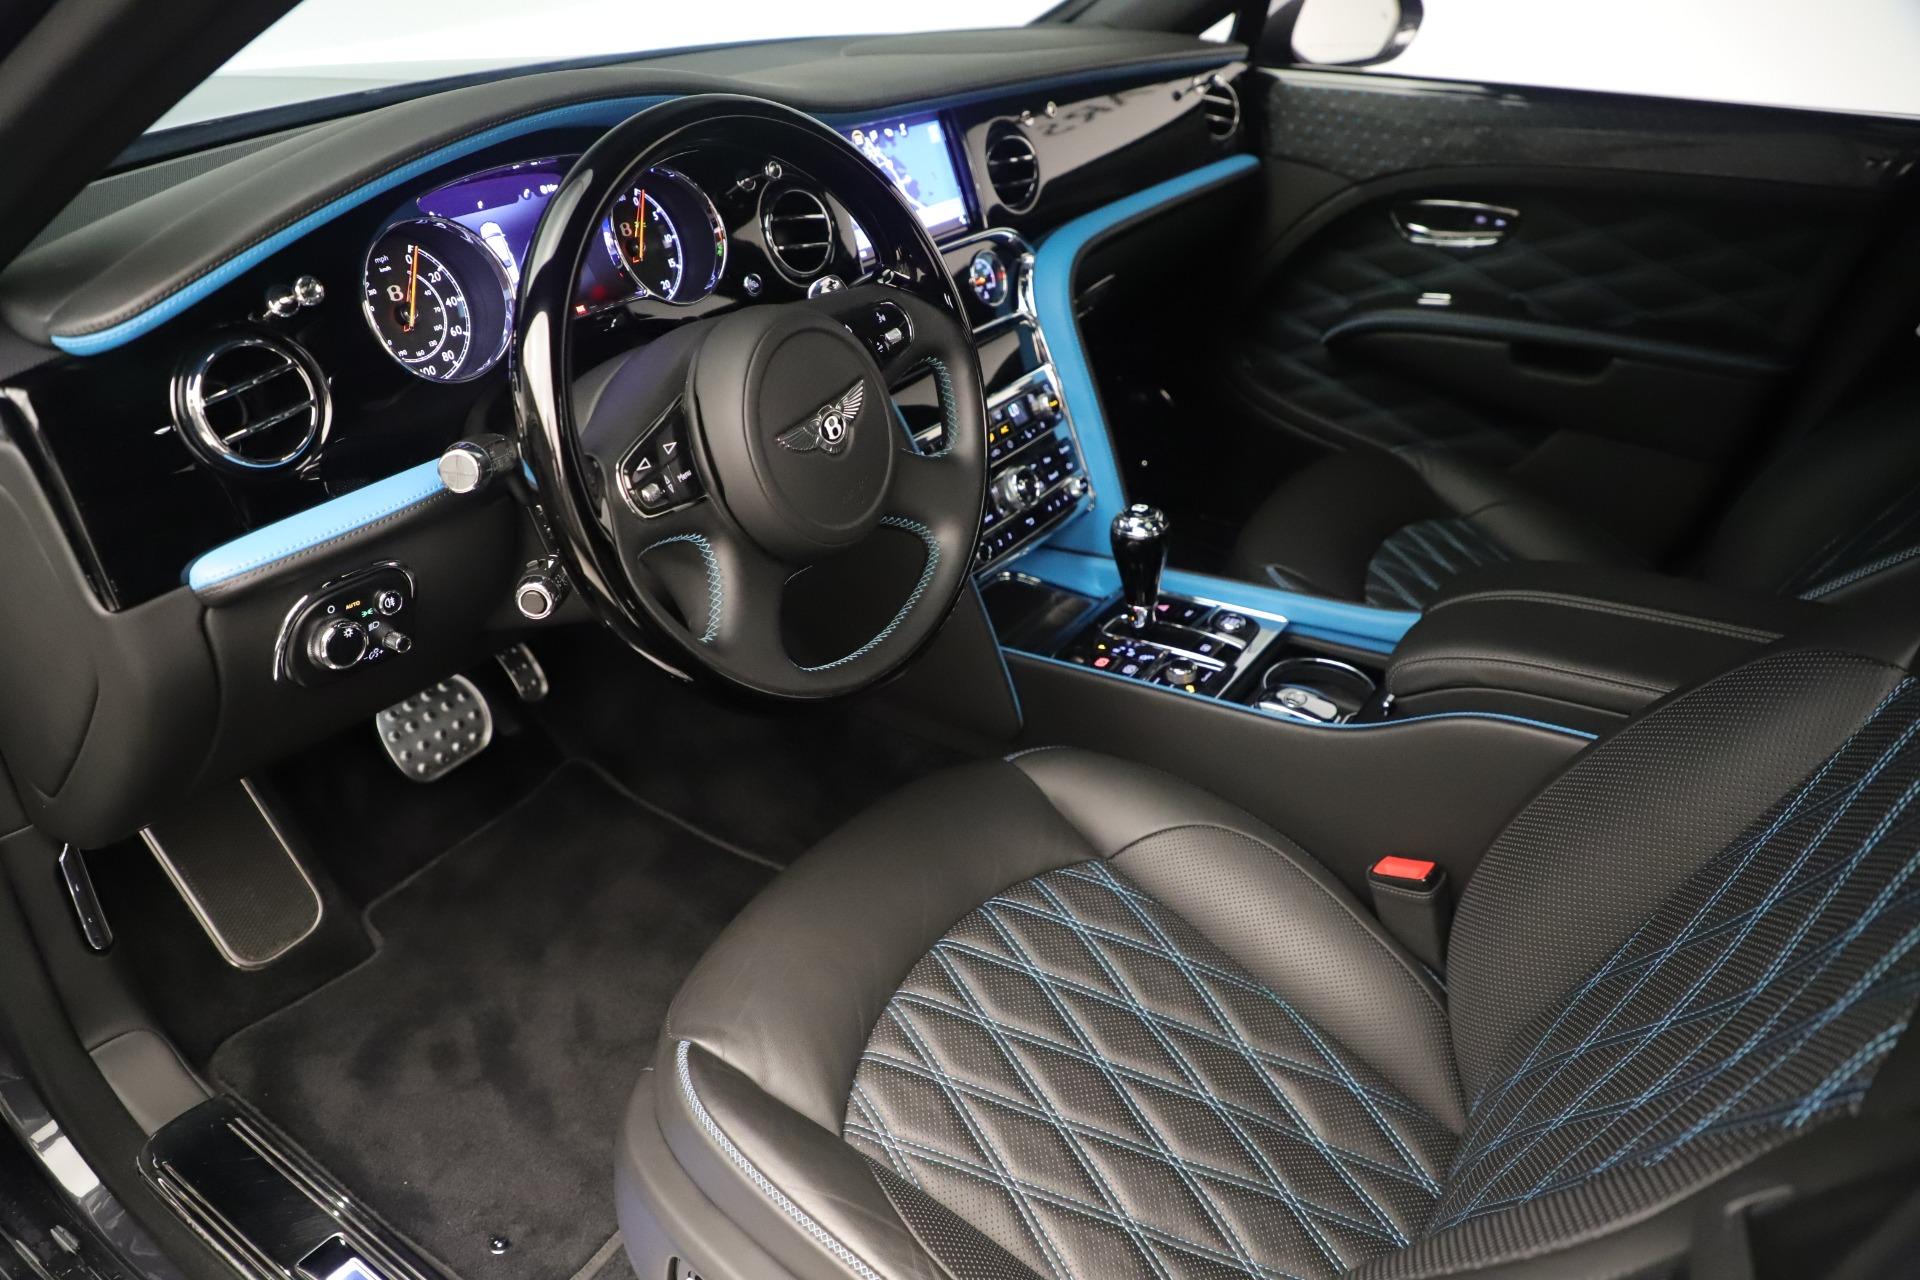 Used 2018 Bentley Mulsanne Speed Design Series For Sale In Westport, CT 3405_p18